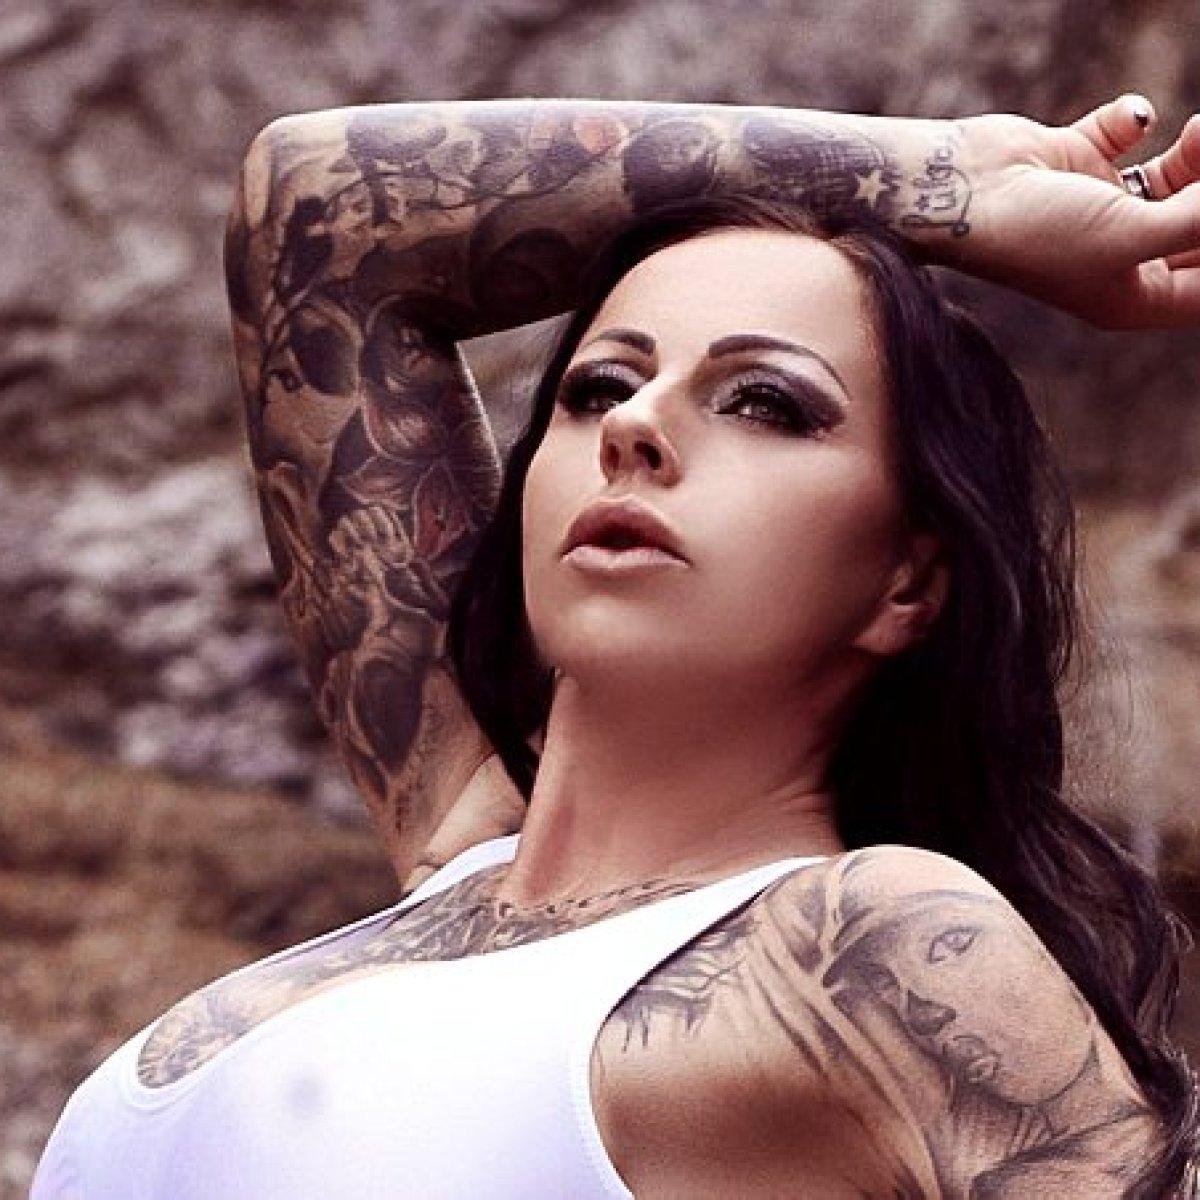 Akt kartei freizügiger model Lilith Whitic